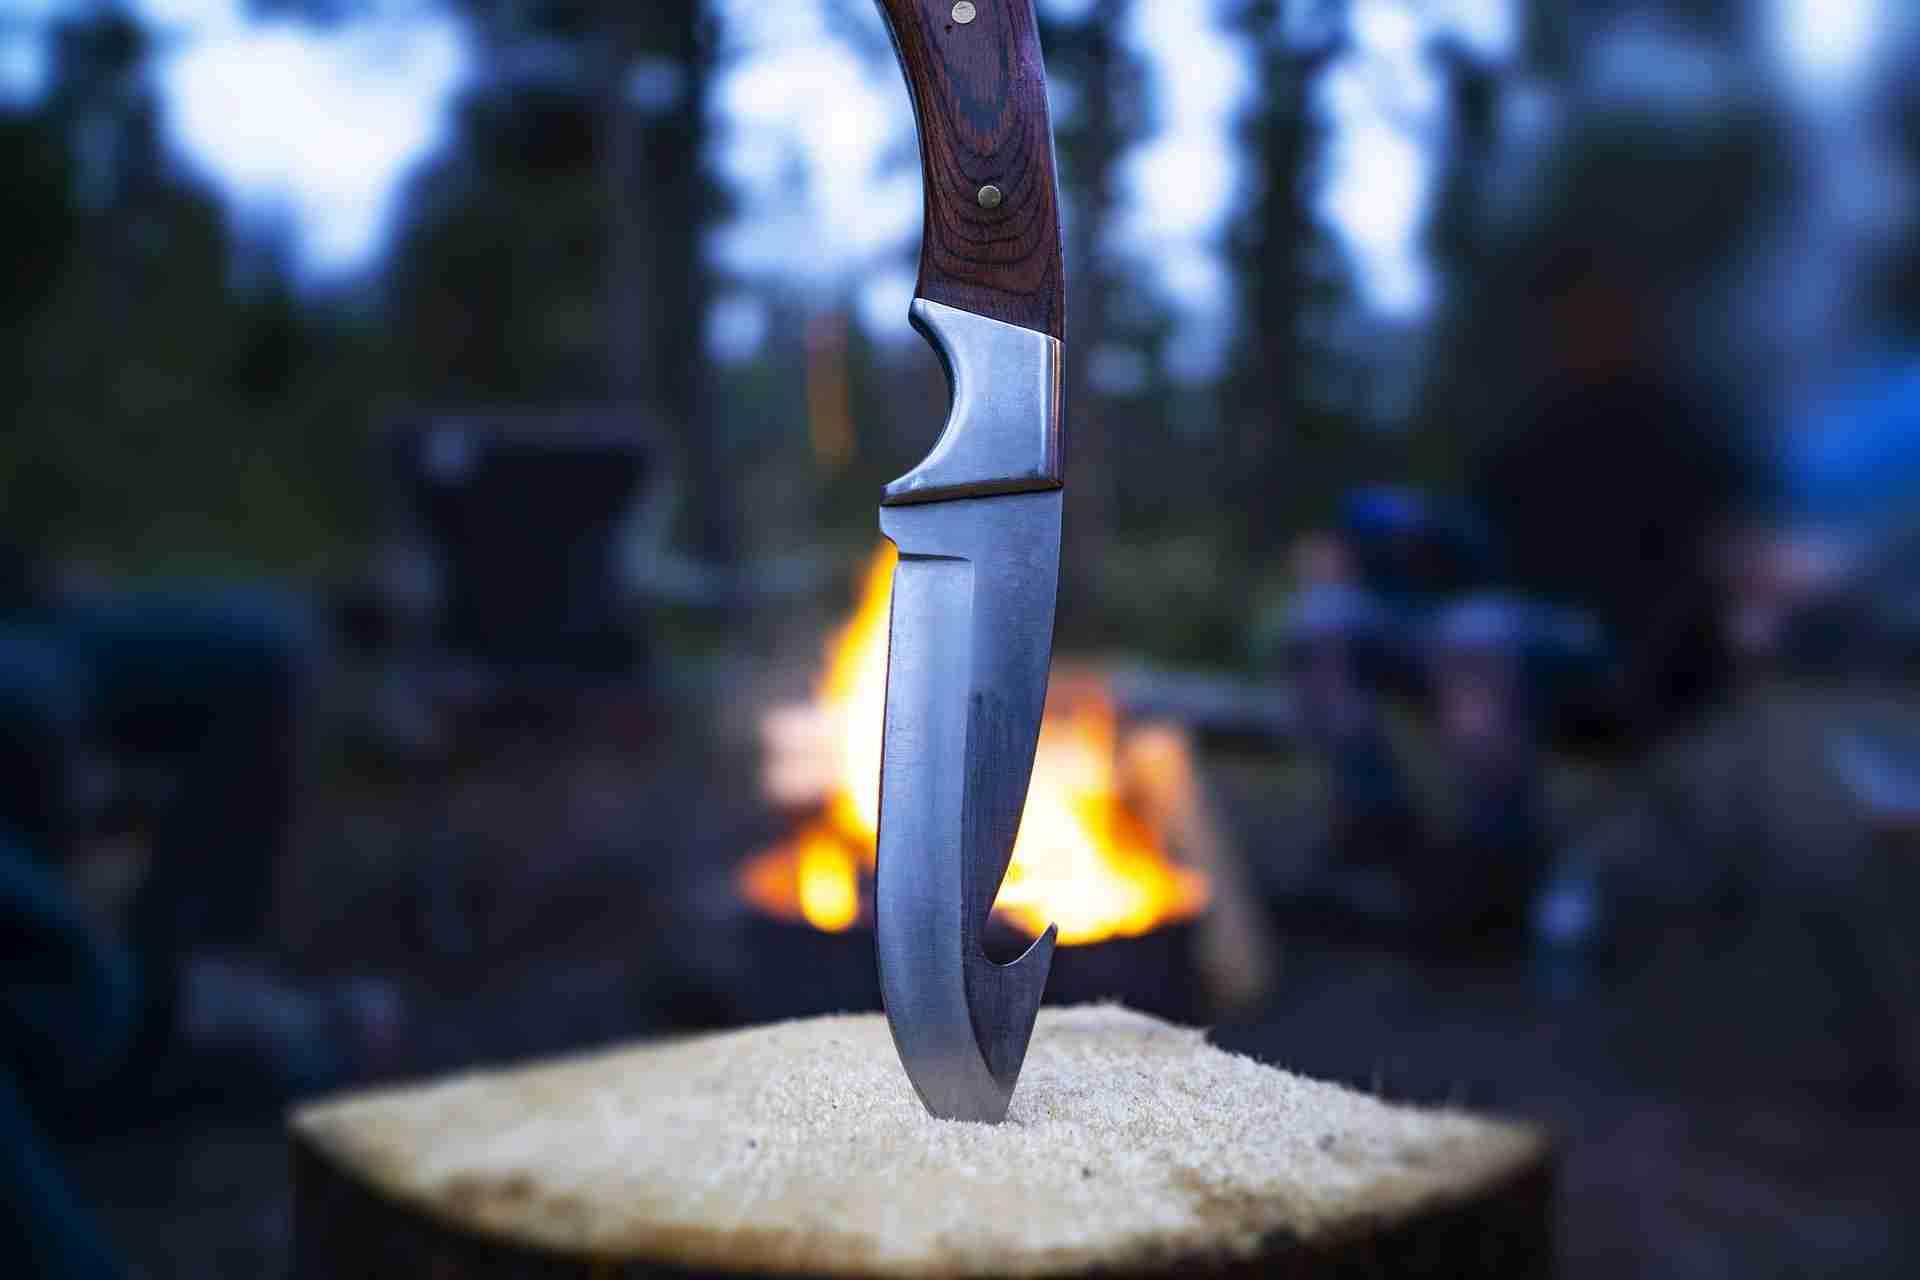 A Cutco hunting knife stuck into a log